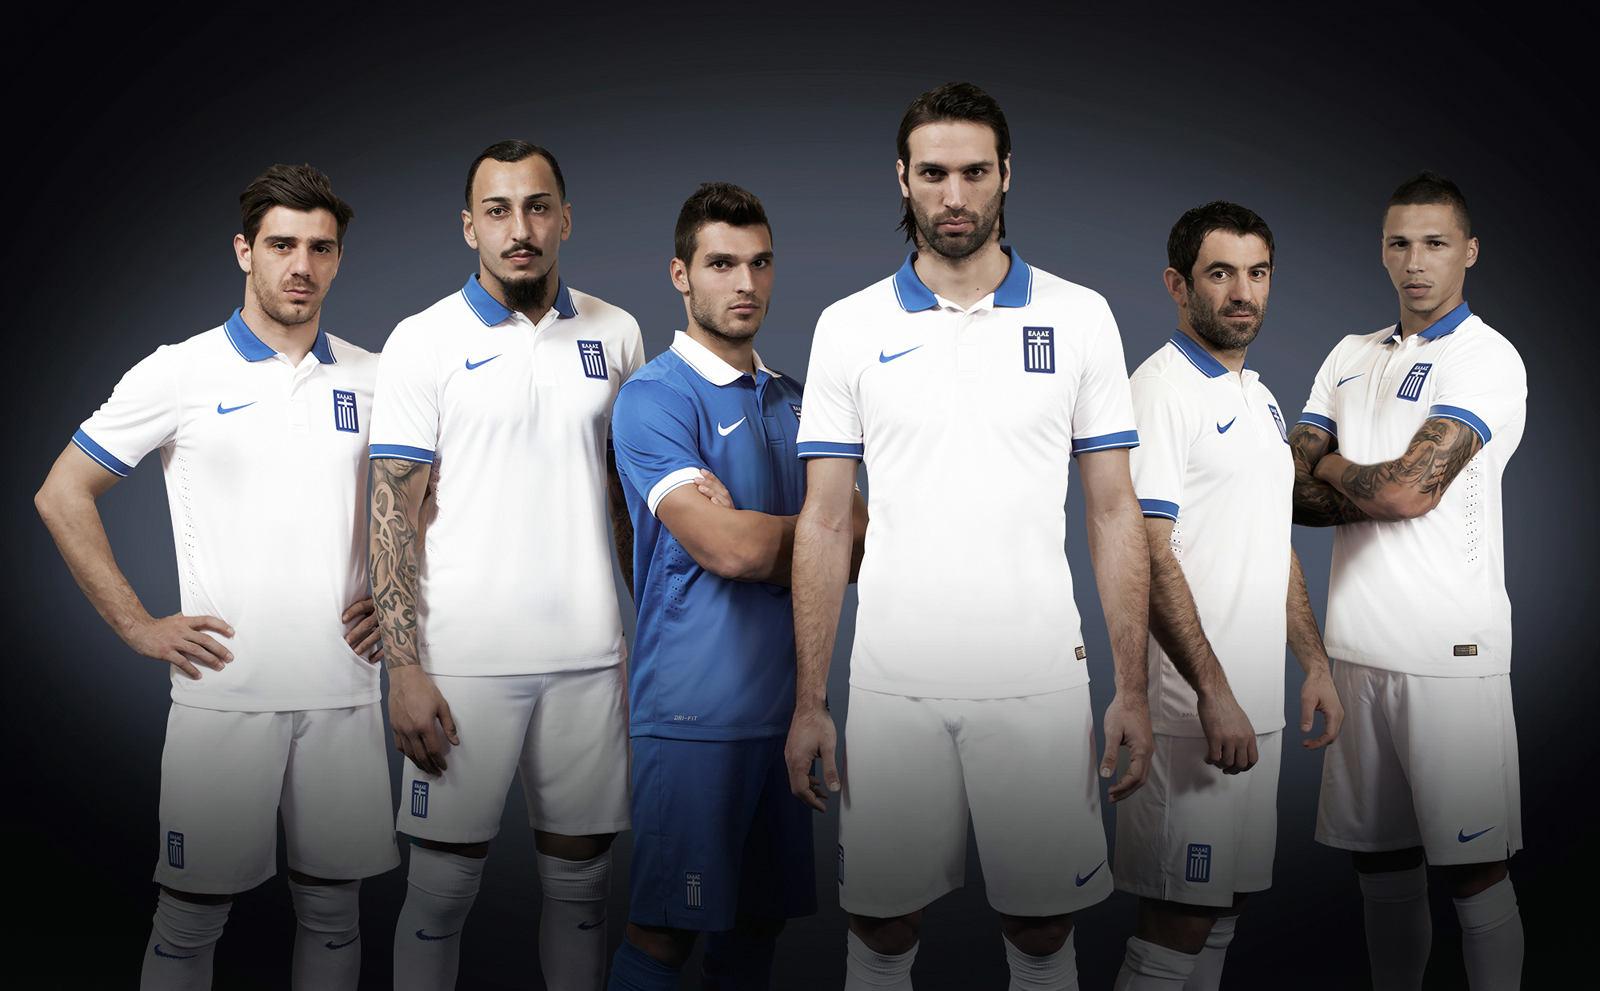 Greece 2014 World Cup Home and Away Kits